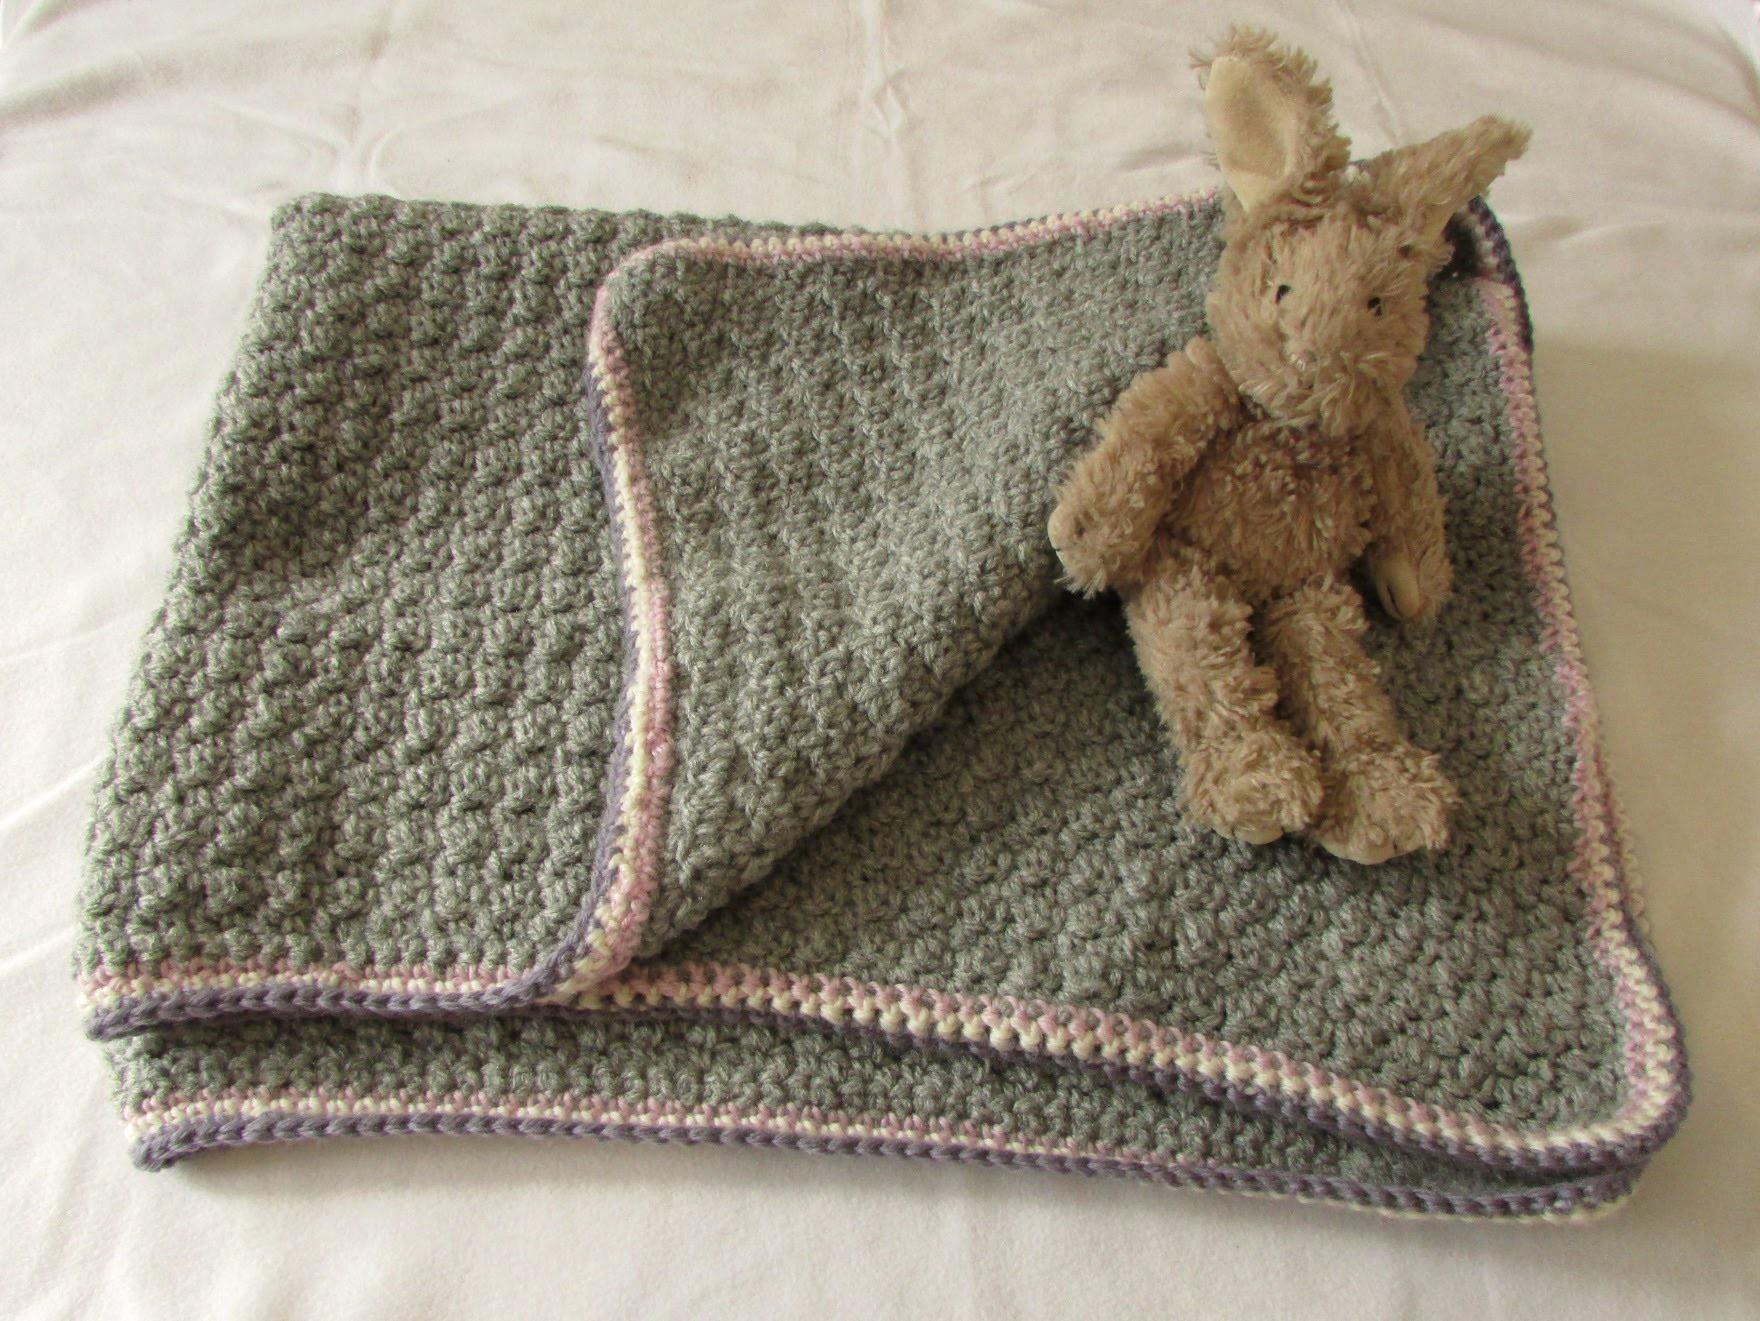 VERY EASY crochet baby blanket for beginners - quick afghan. throw